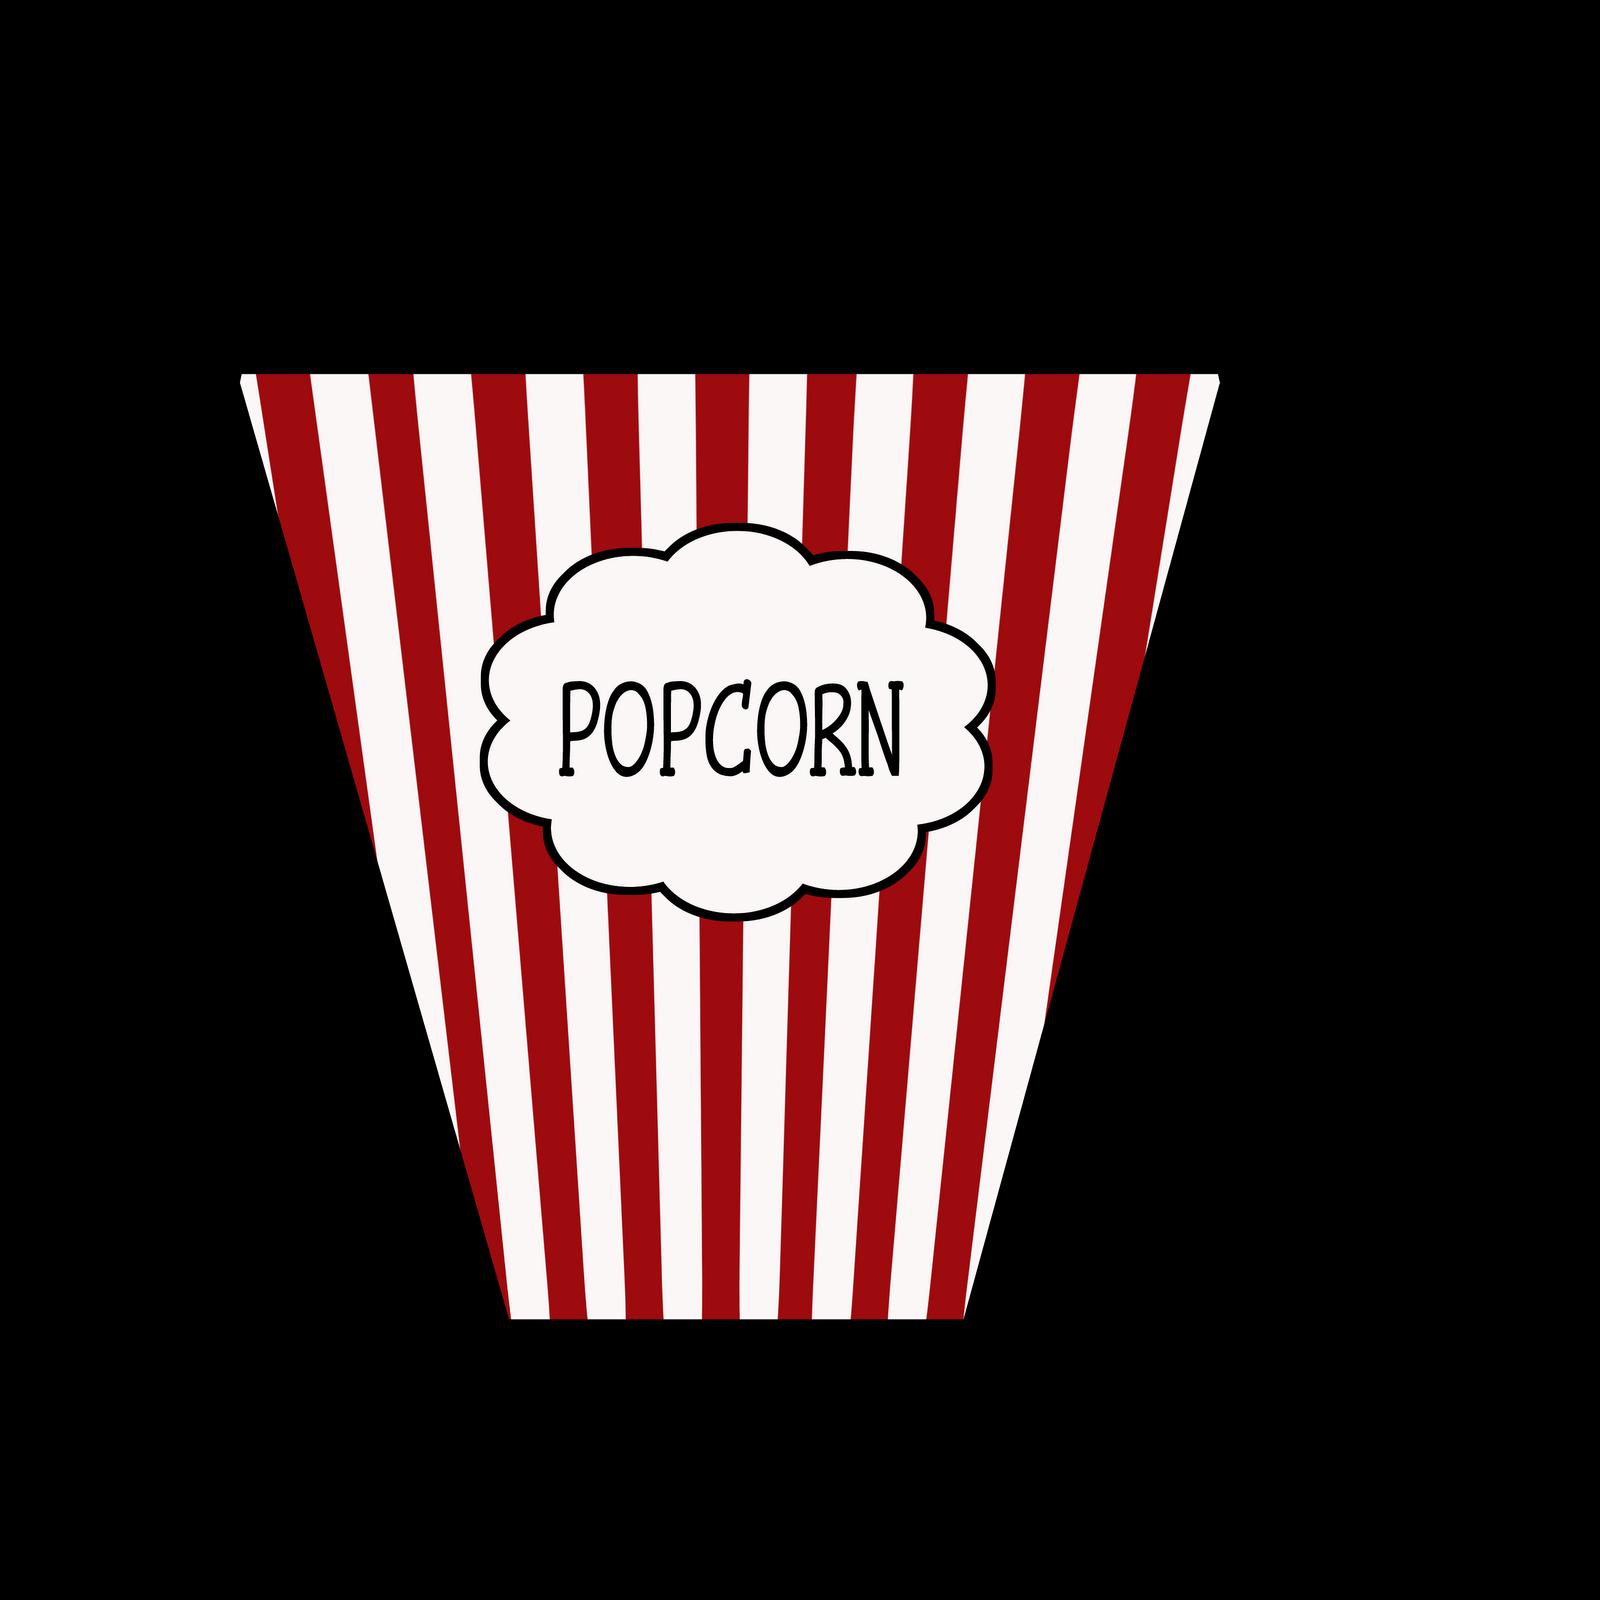 clipart free popcorn